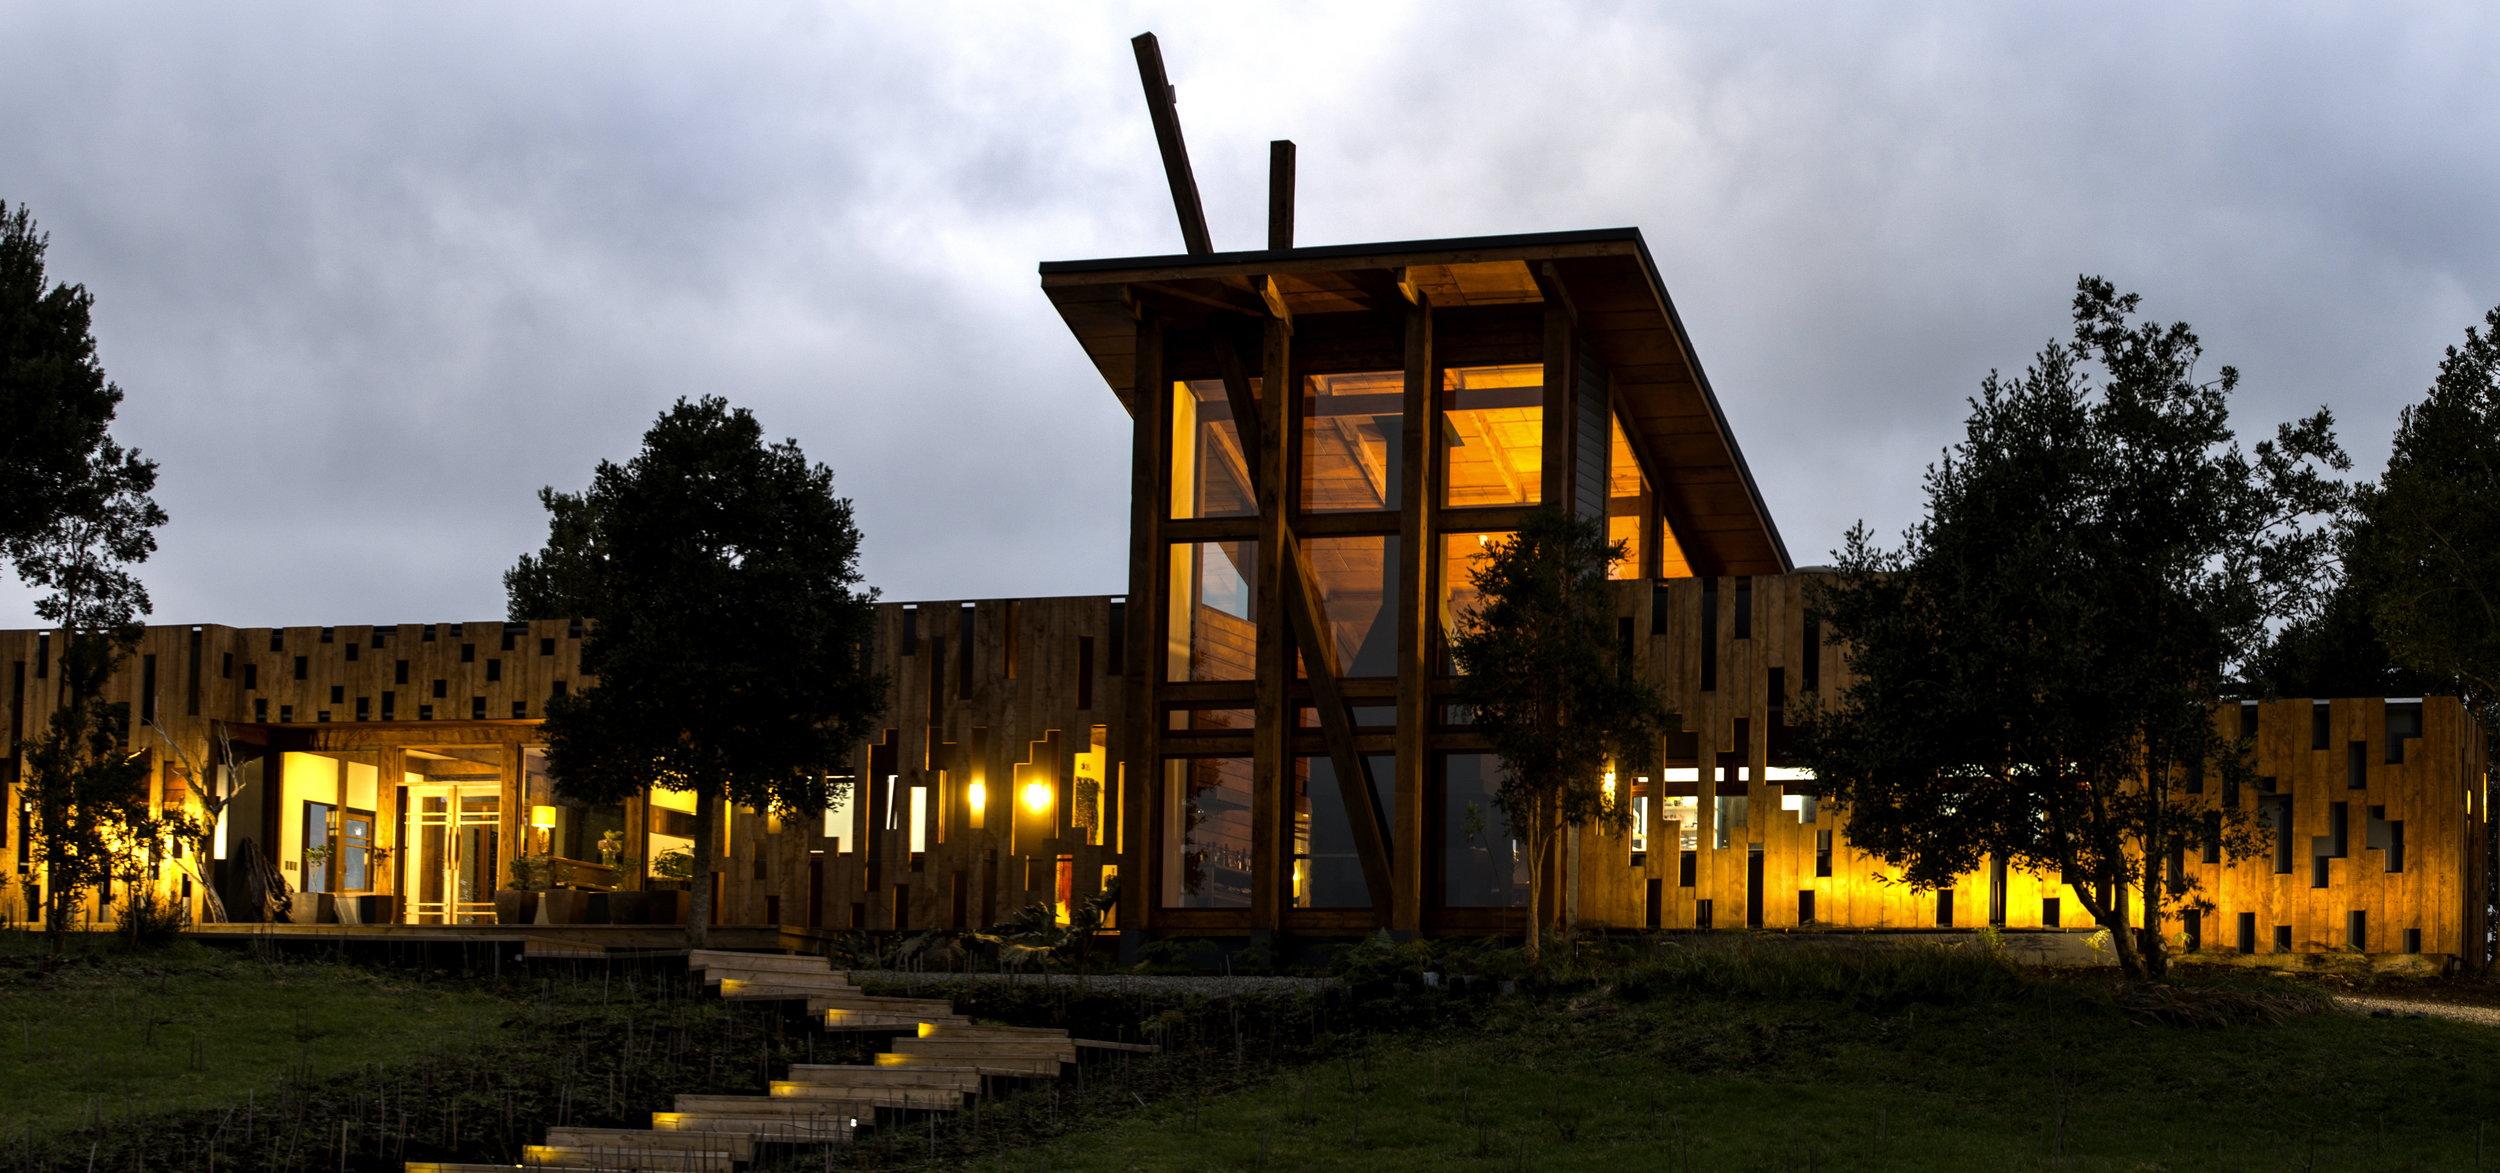 FB_055_2013_Cantarias Lodge453_D800_PANO 1.jpg